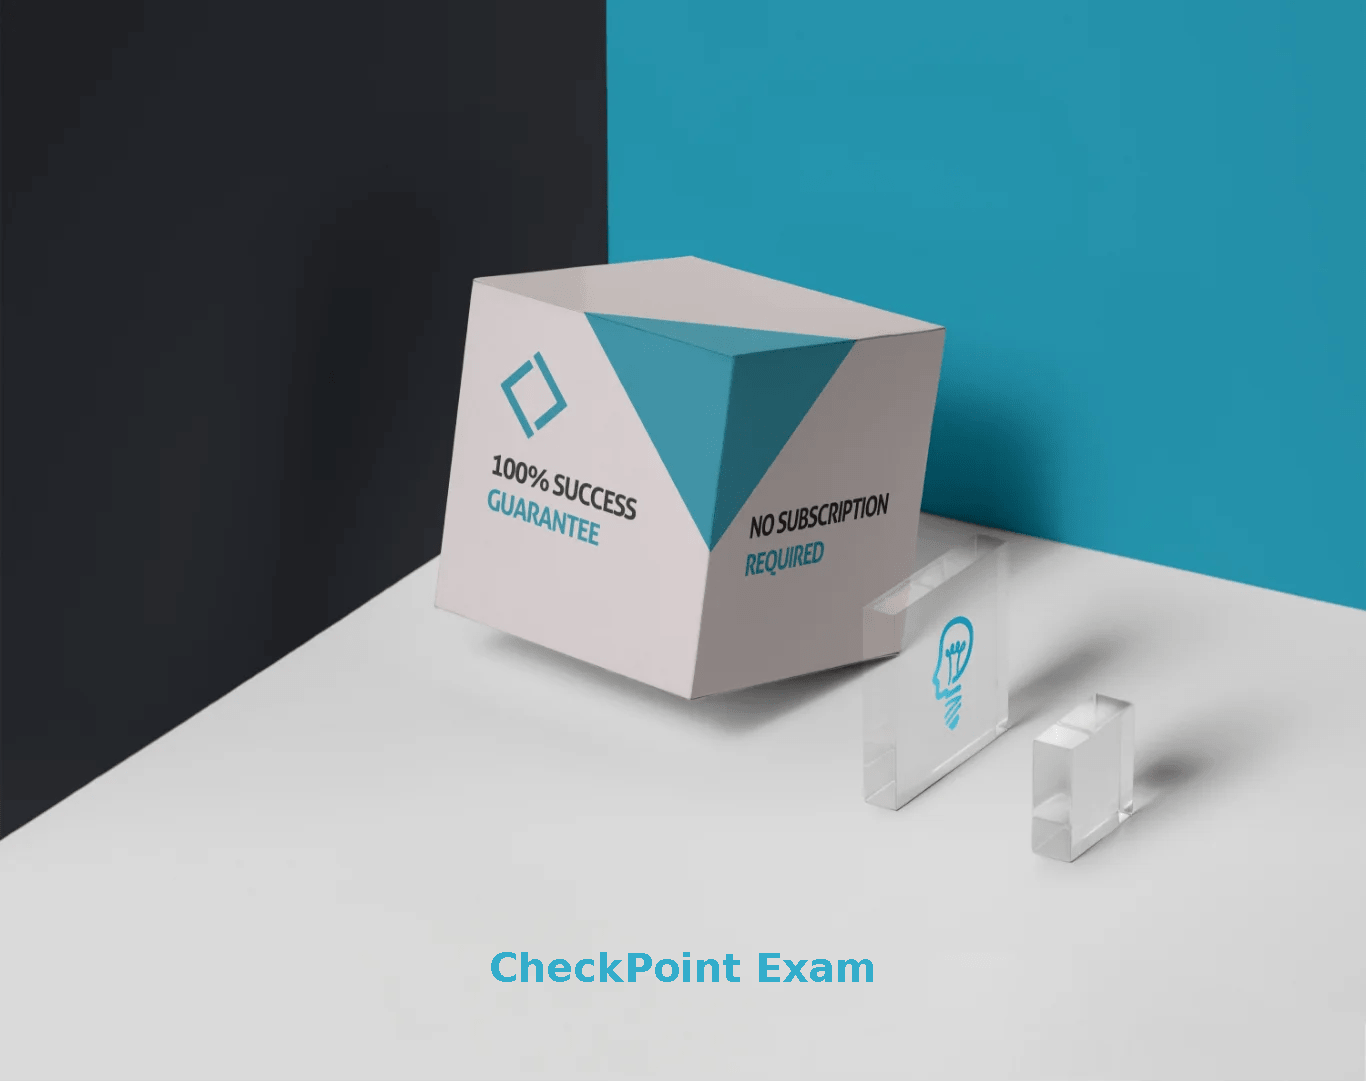 Checkpoint Exam Dumps